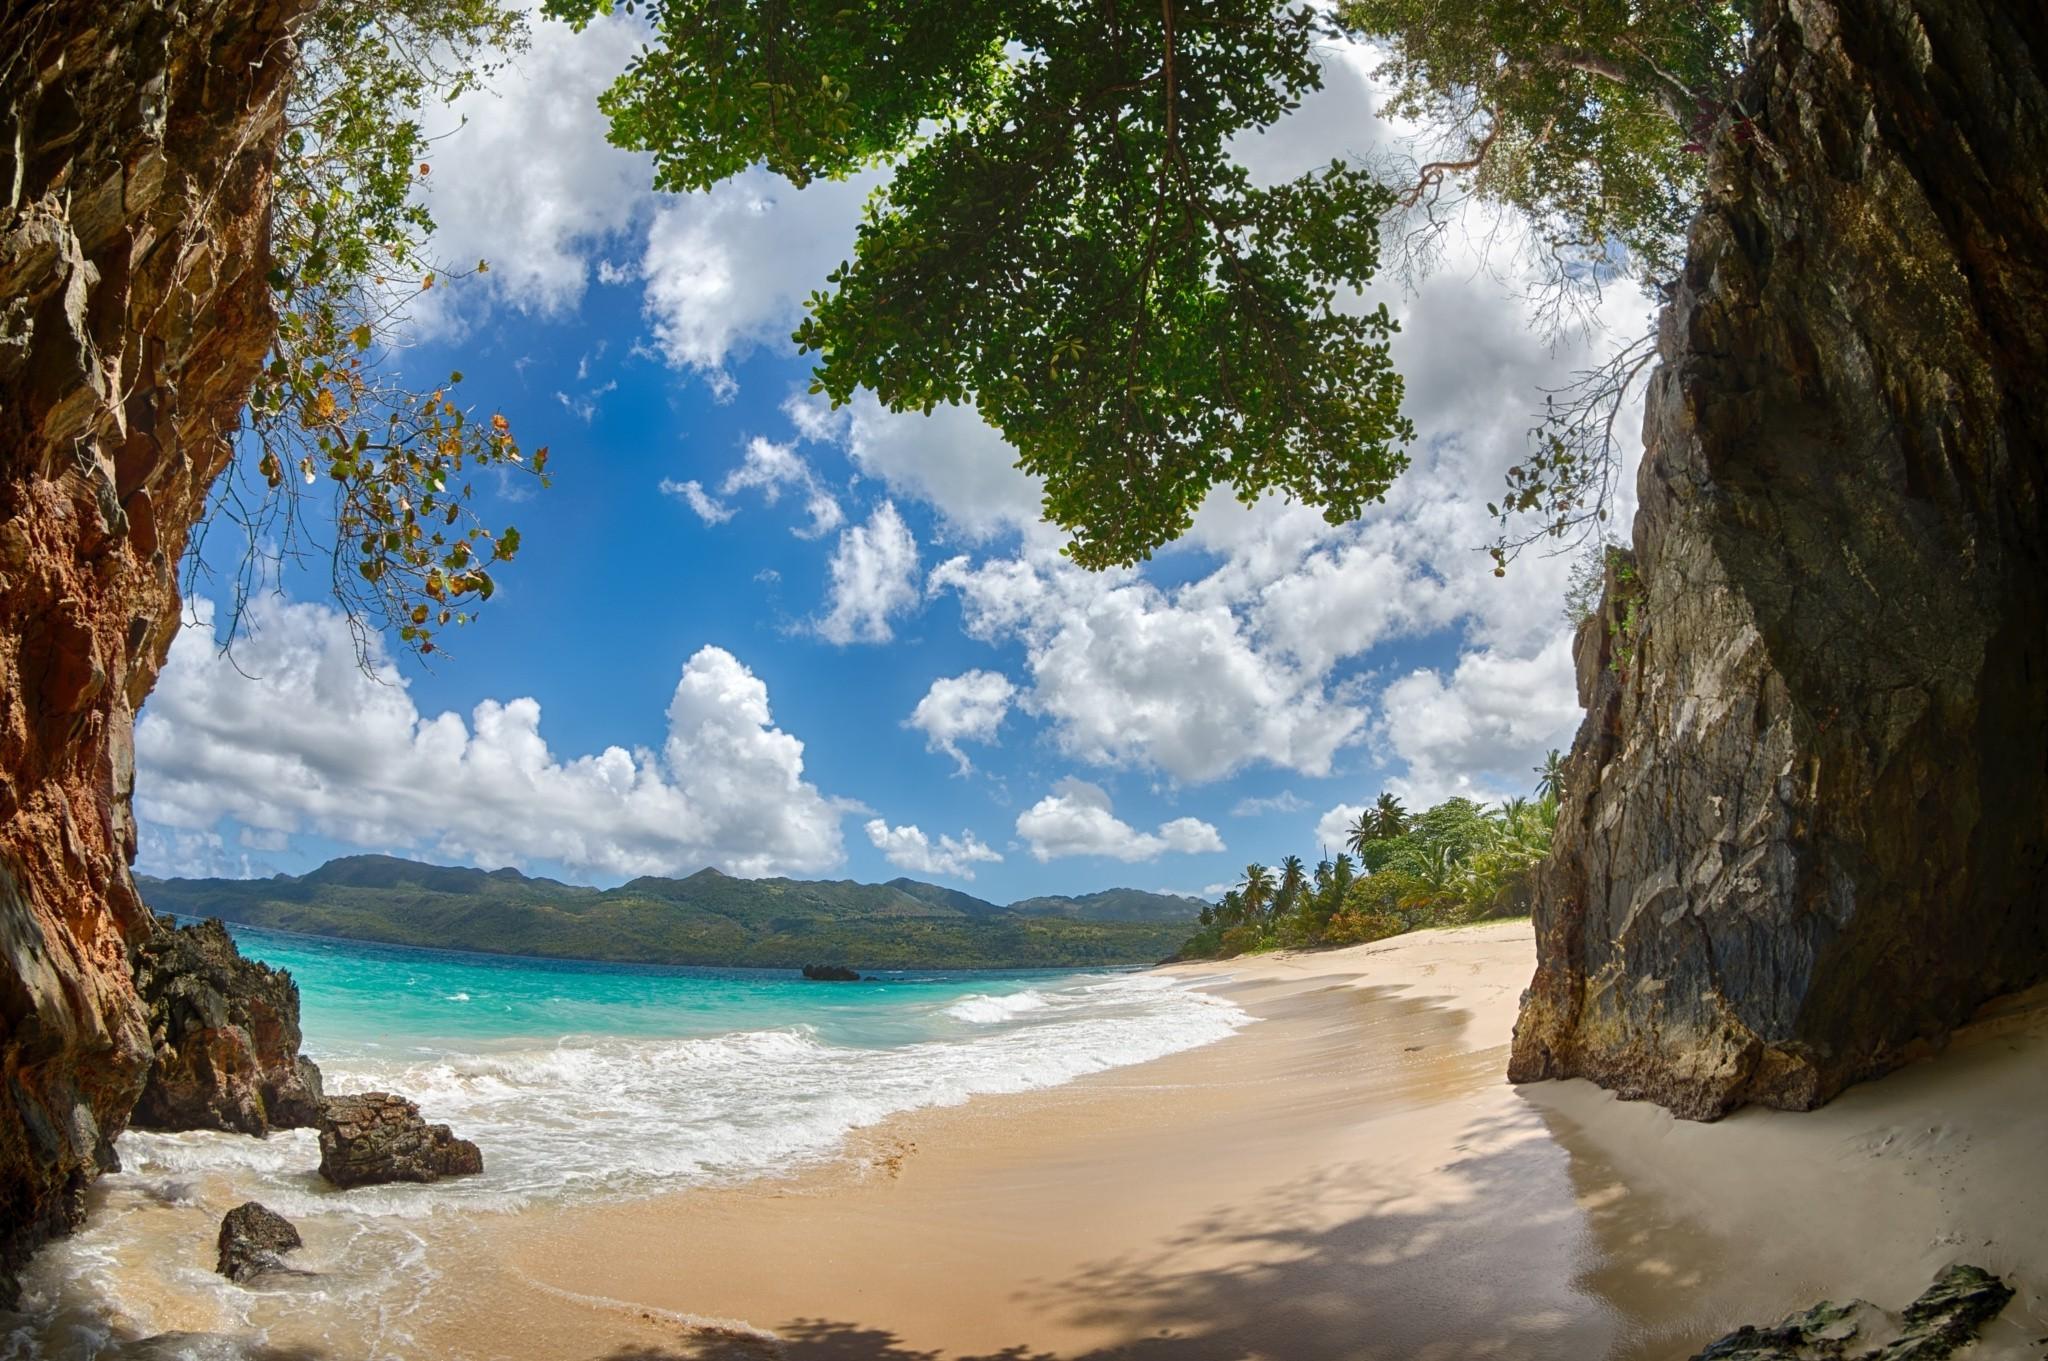 beach, Tropical, Sand, Mountain, Caribbean, Palm Trees, Clouds, Rock